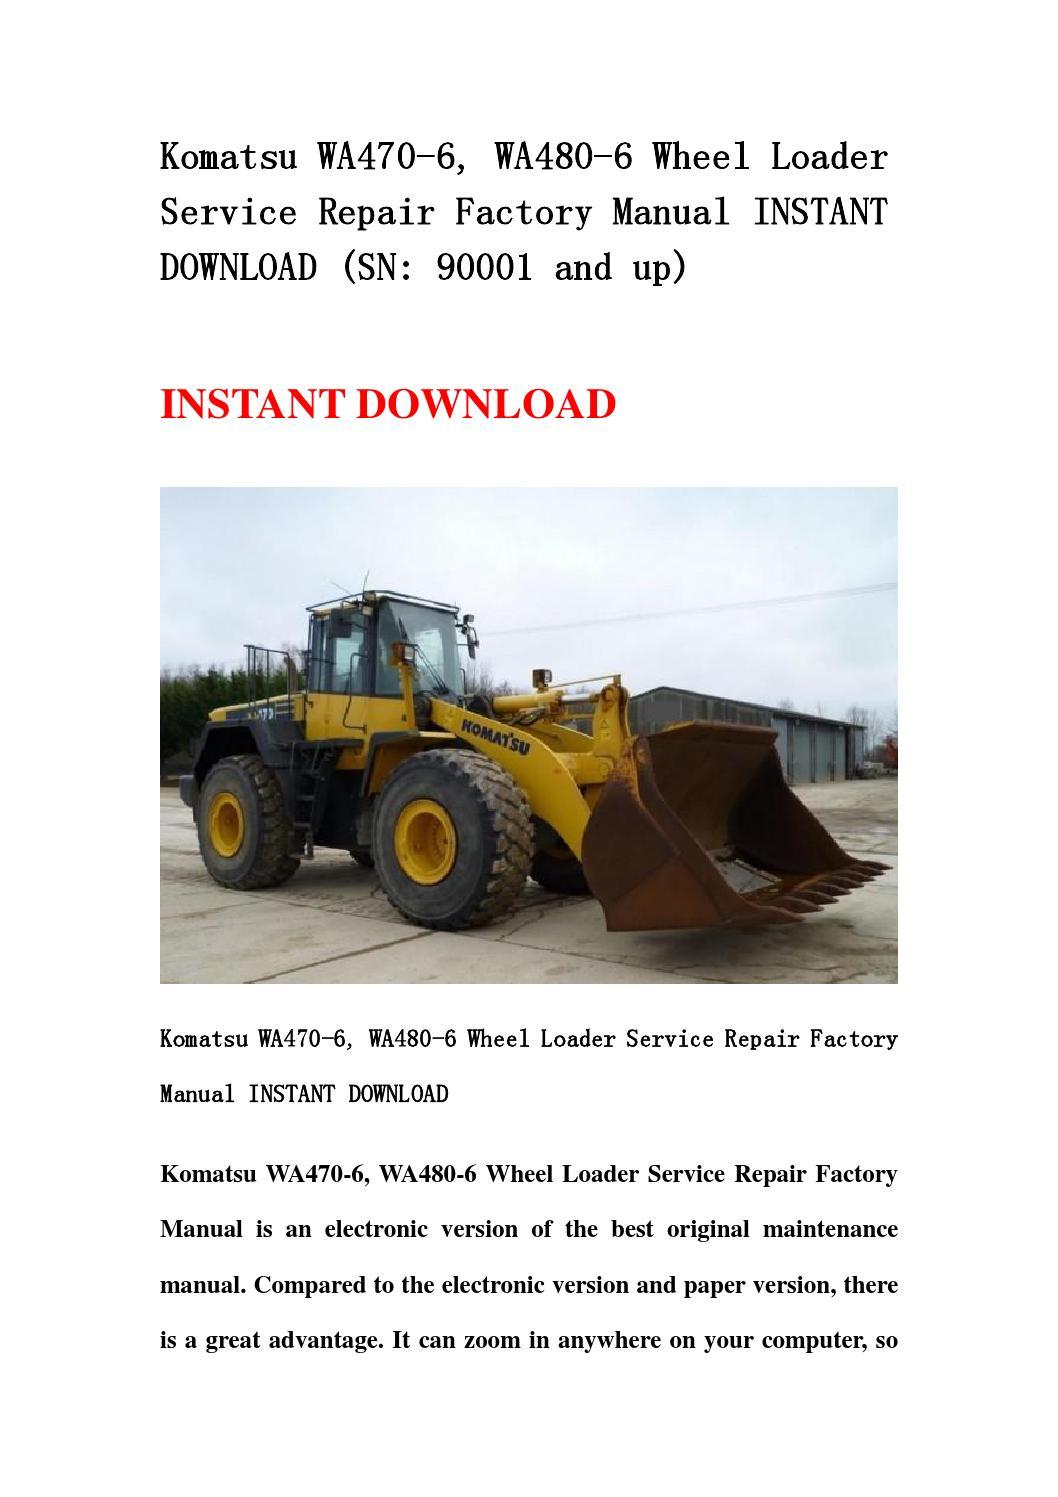 ... parts list manual for yanmar 3tnv88 xms download here Array - komatsu  wa470 3 avance wheel loader service manuals food is rh crystalclear tk